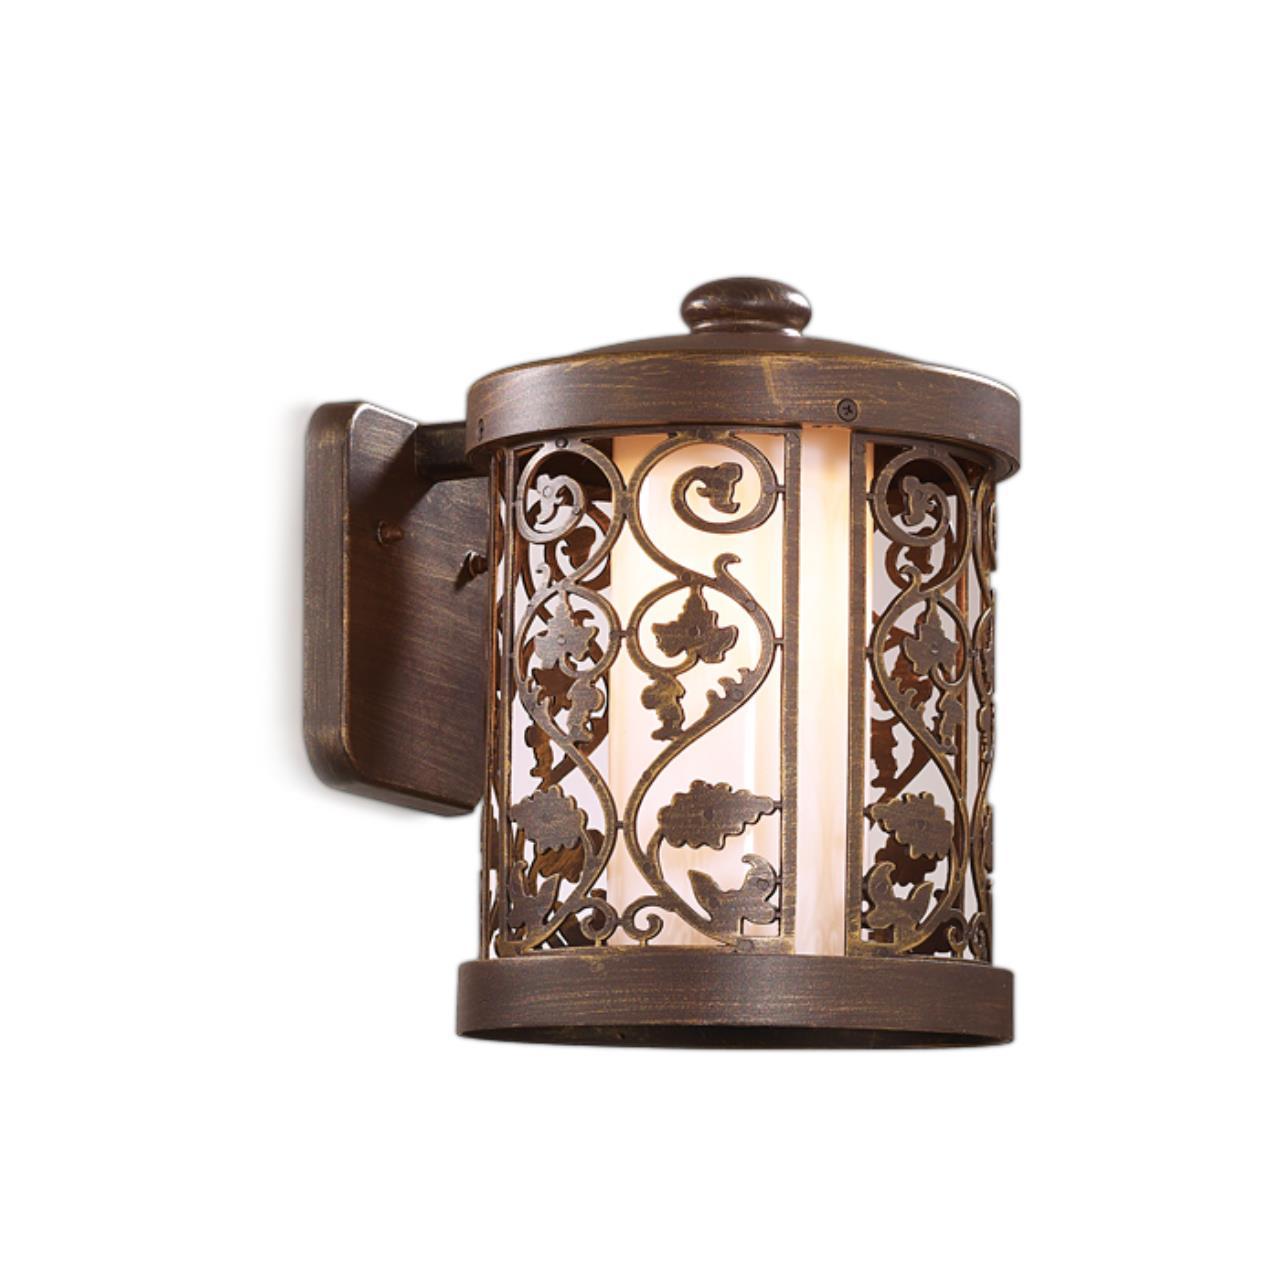 2286/1W NATURE ODL12 715 патина коричневый Уличный настен светильник IP44 E27 100W 220V KORDI